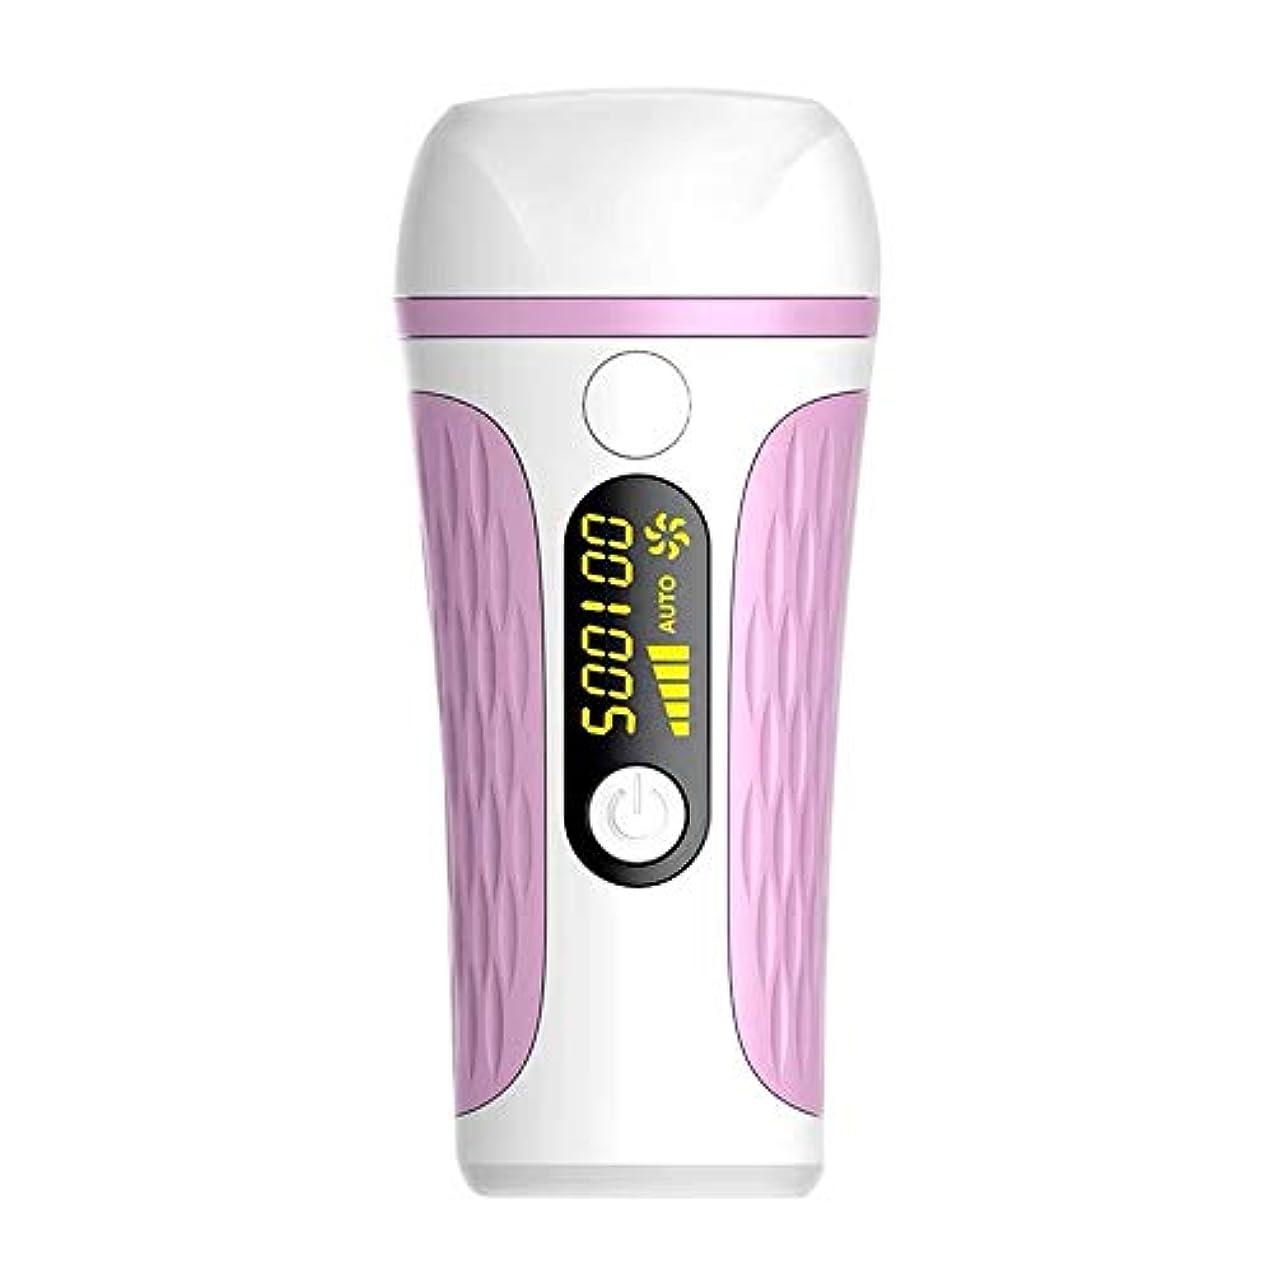 IPL脱毛美容機器脱毛器女性レディーシェーバー用永久に目に見える脱毛のための顔と全身,Pink